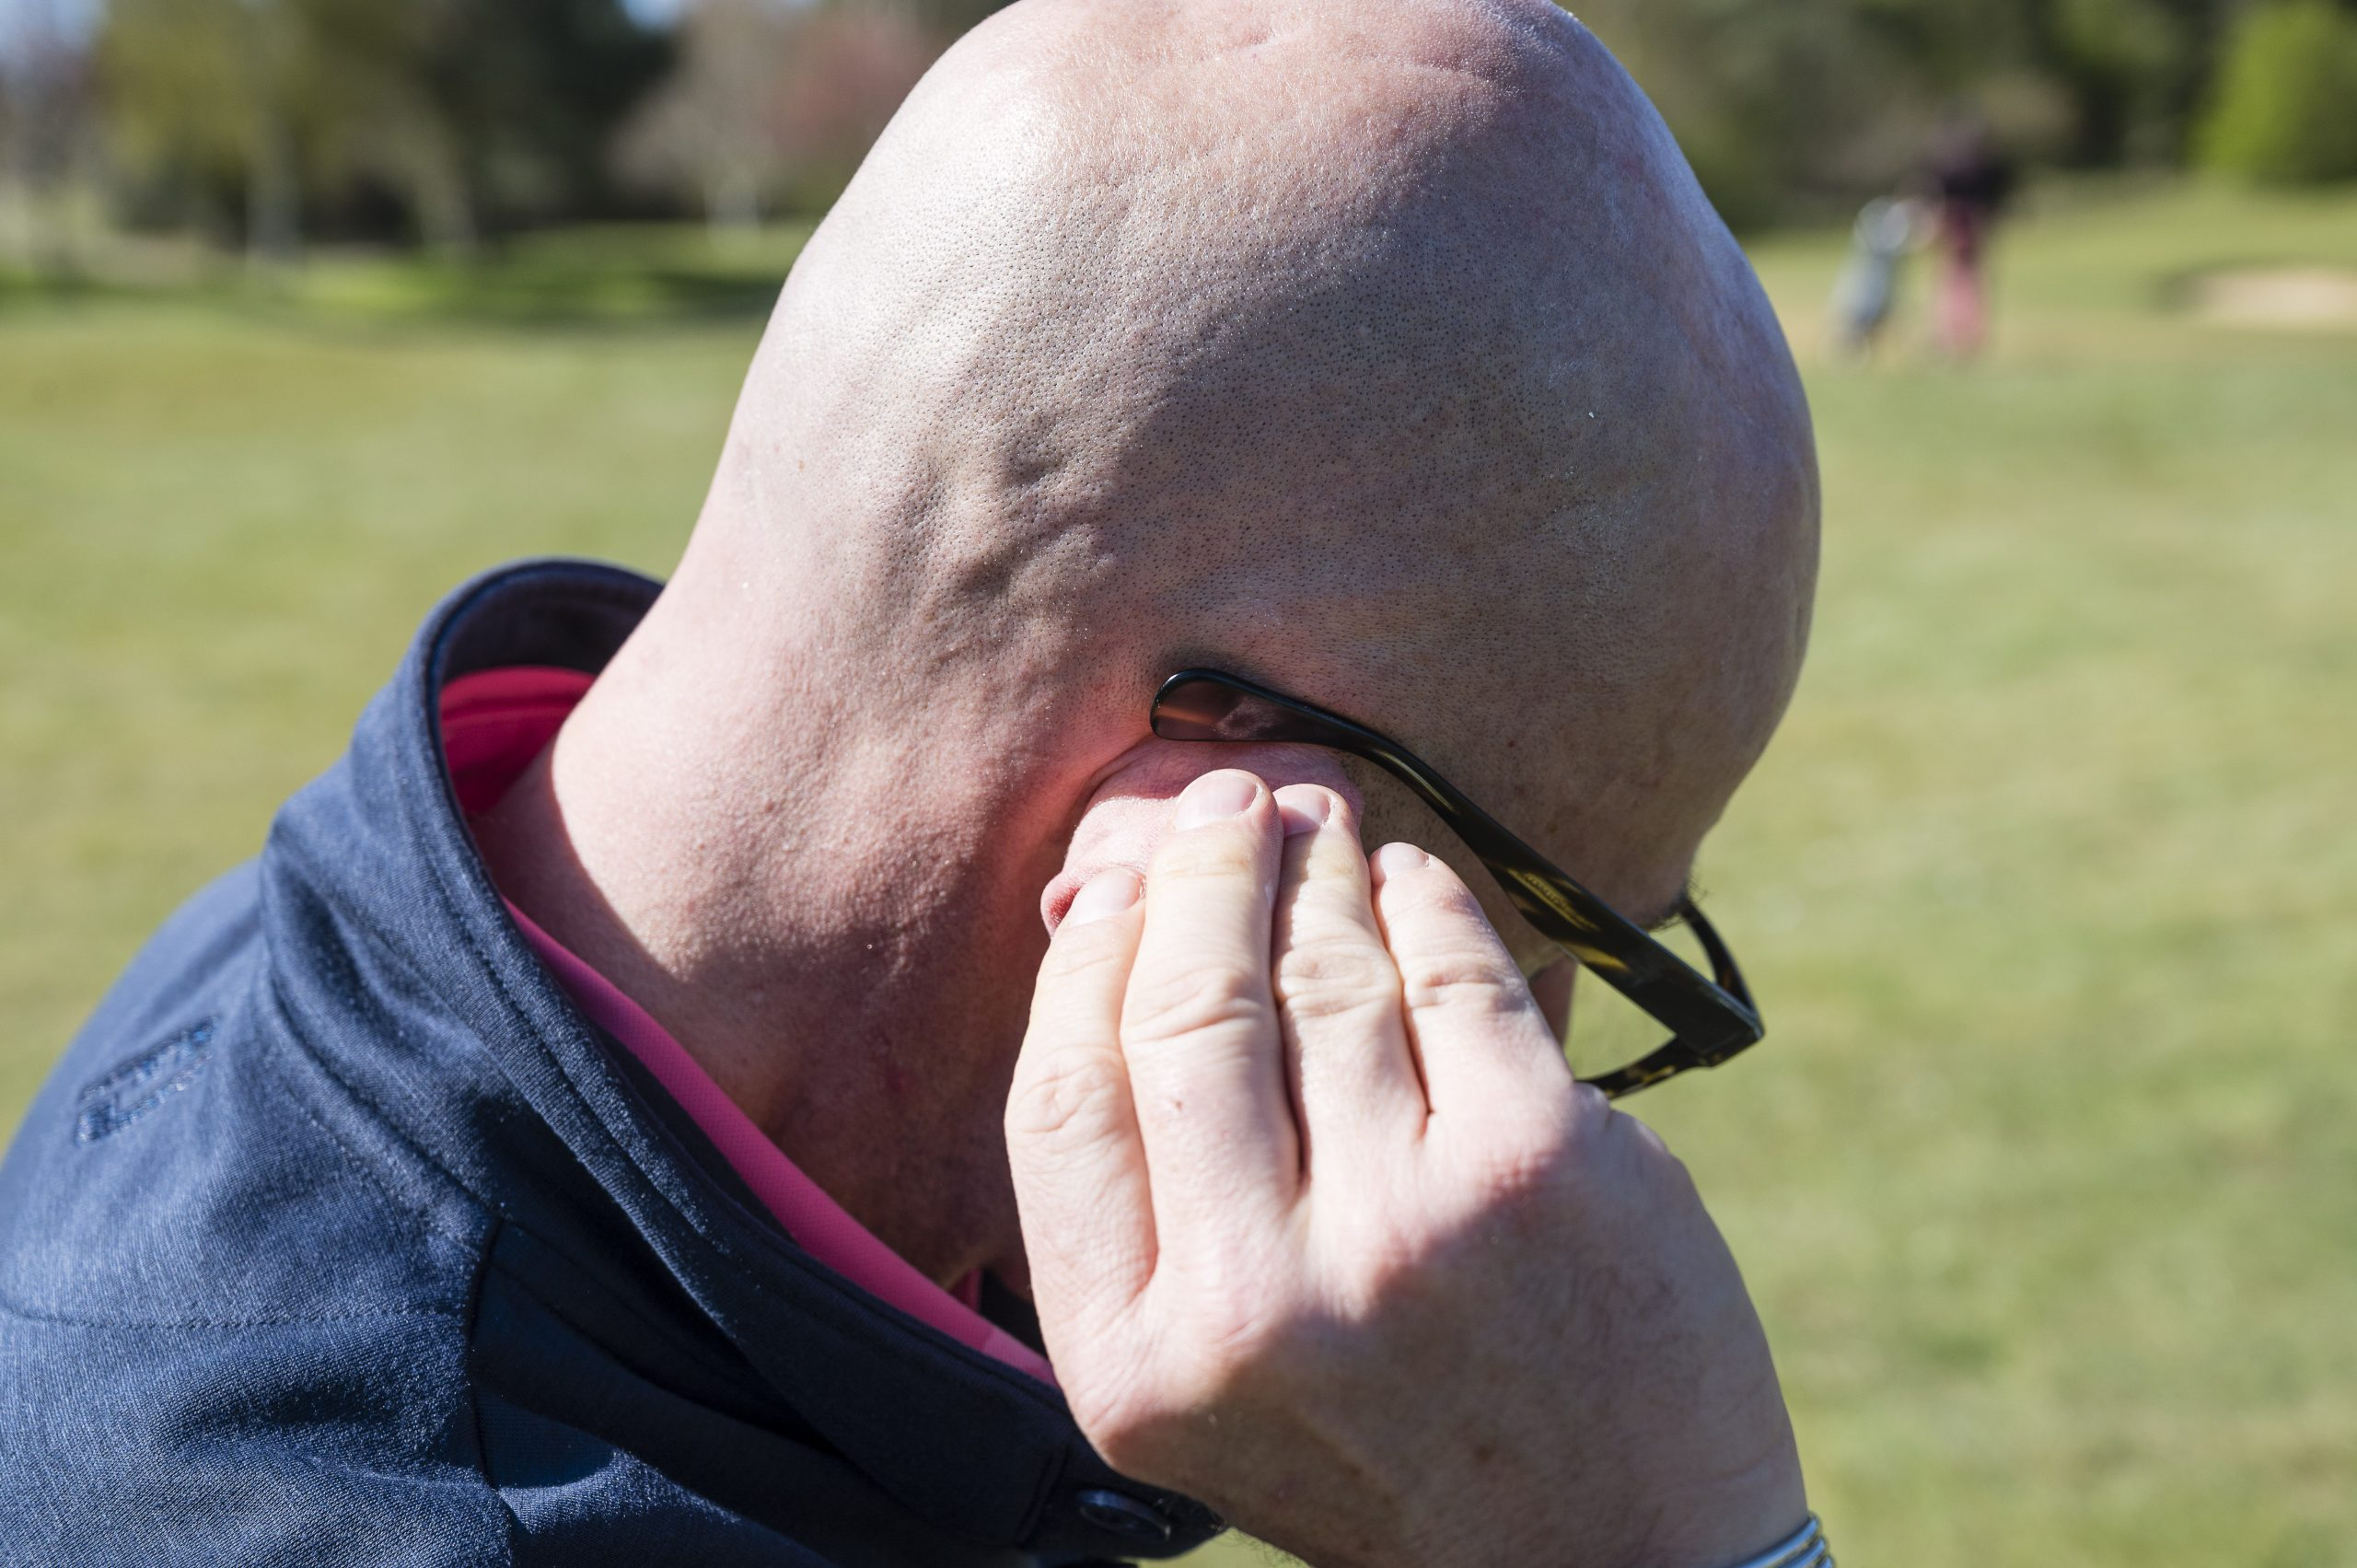 Why Golfers Need To Wear Sunscreen